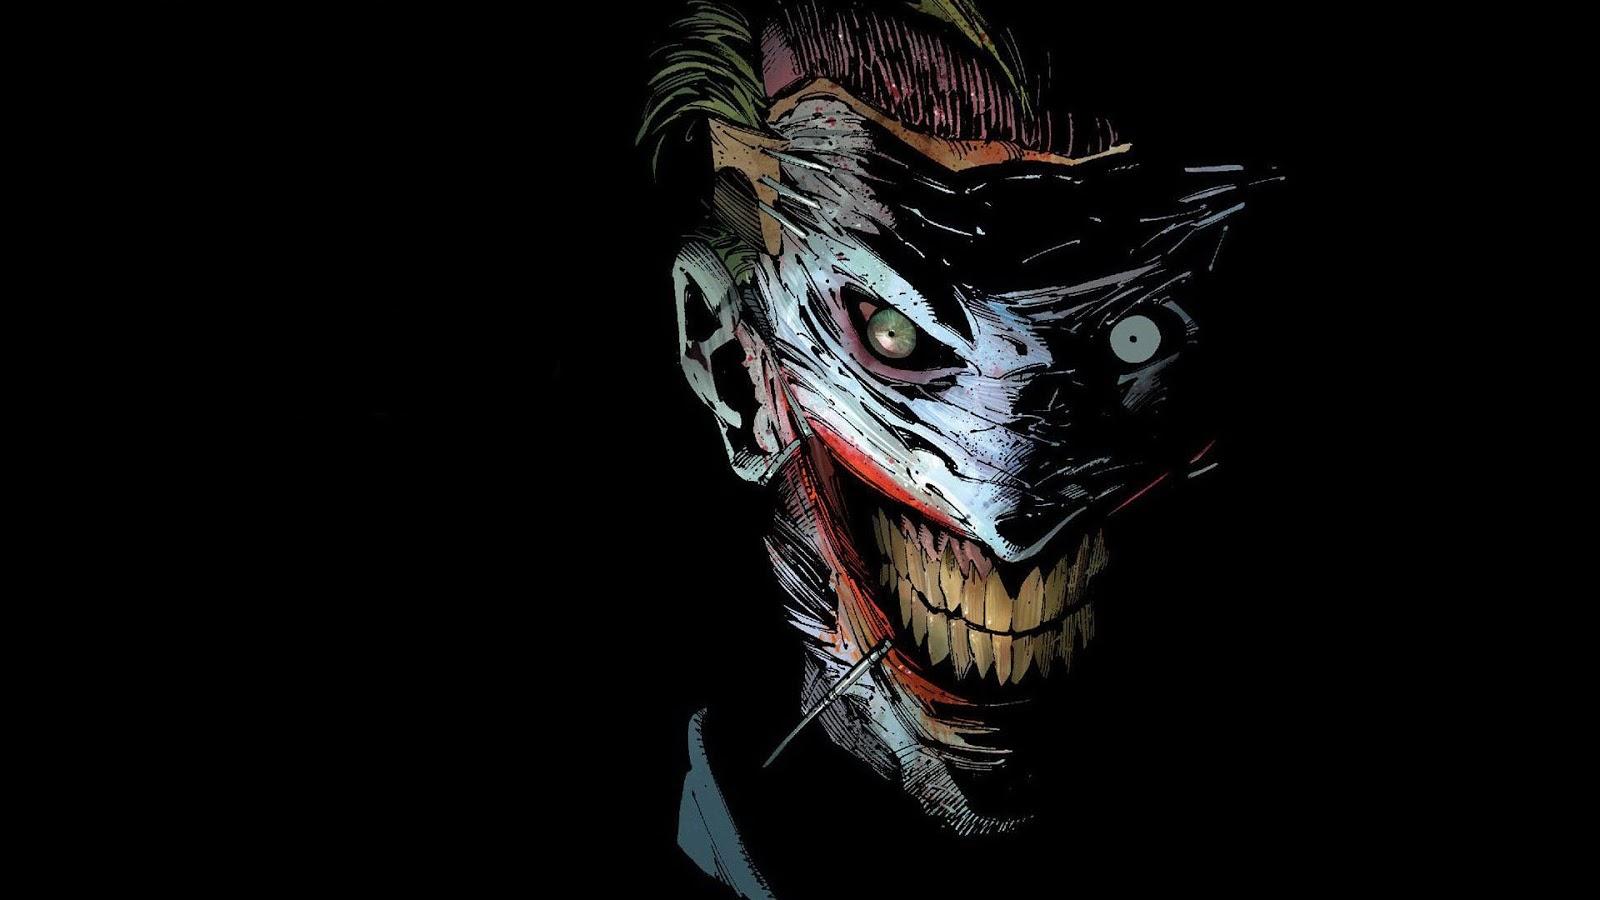 Download The Joker HD Wallpaper For Desktop and Mac 1600x900